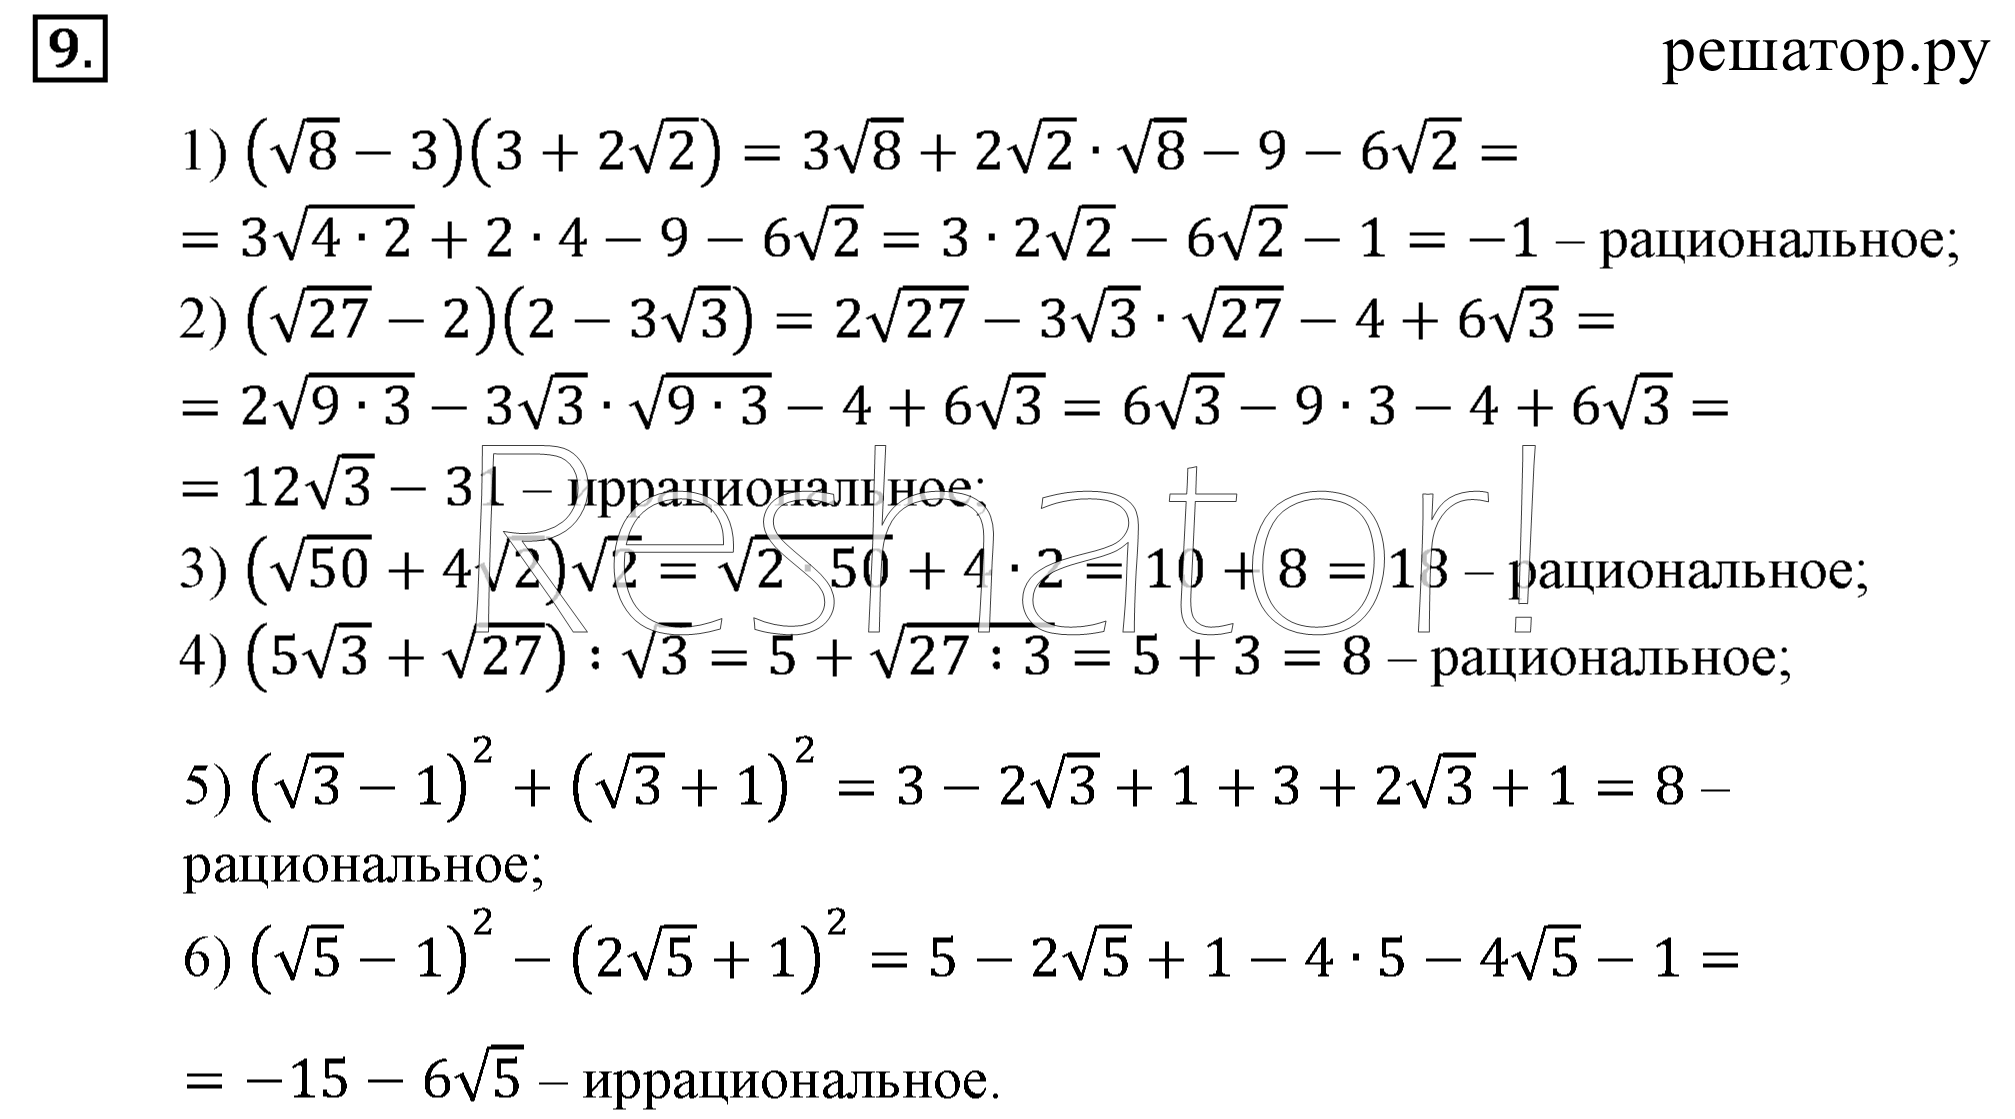 Учебники по алгебре и началам математического анализа страница 1.